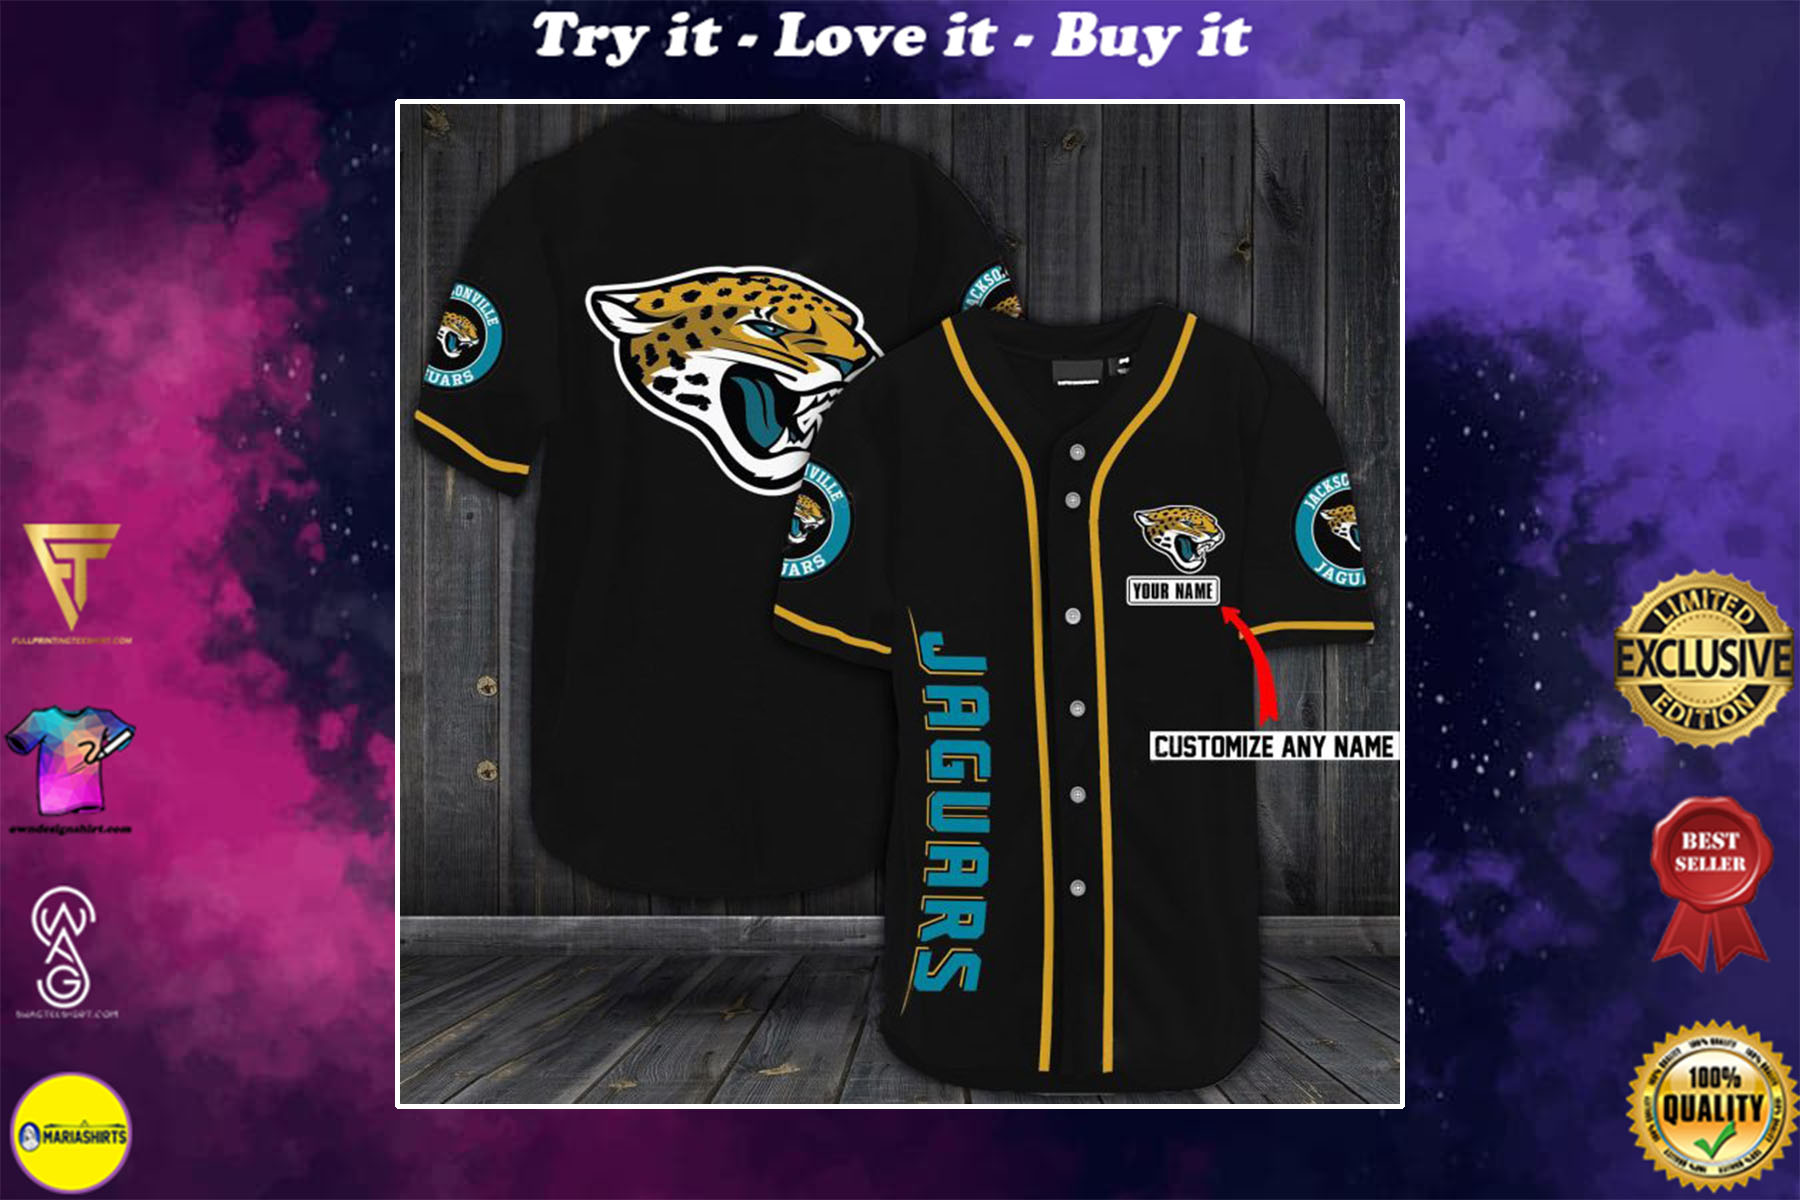 [special edition] custom name jersey jacksonville jaguars shirt - maria